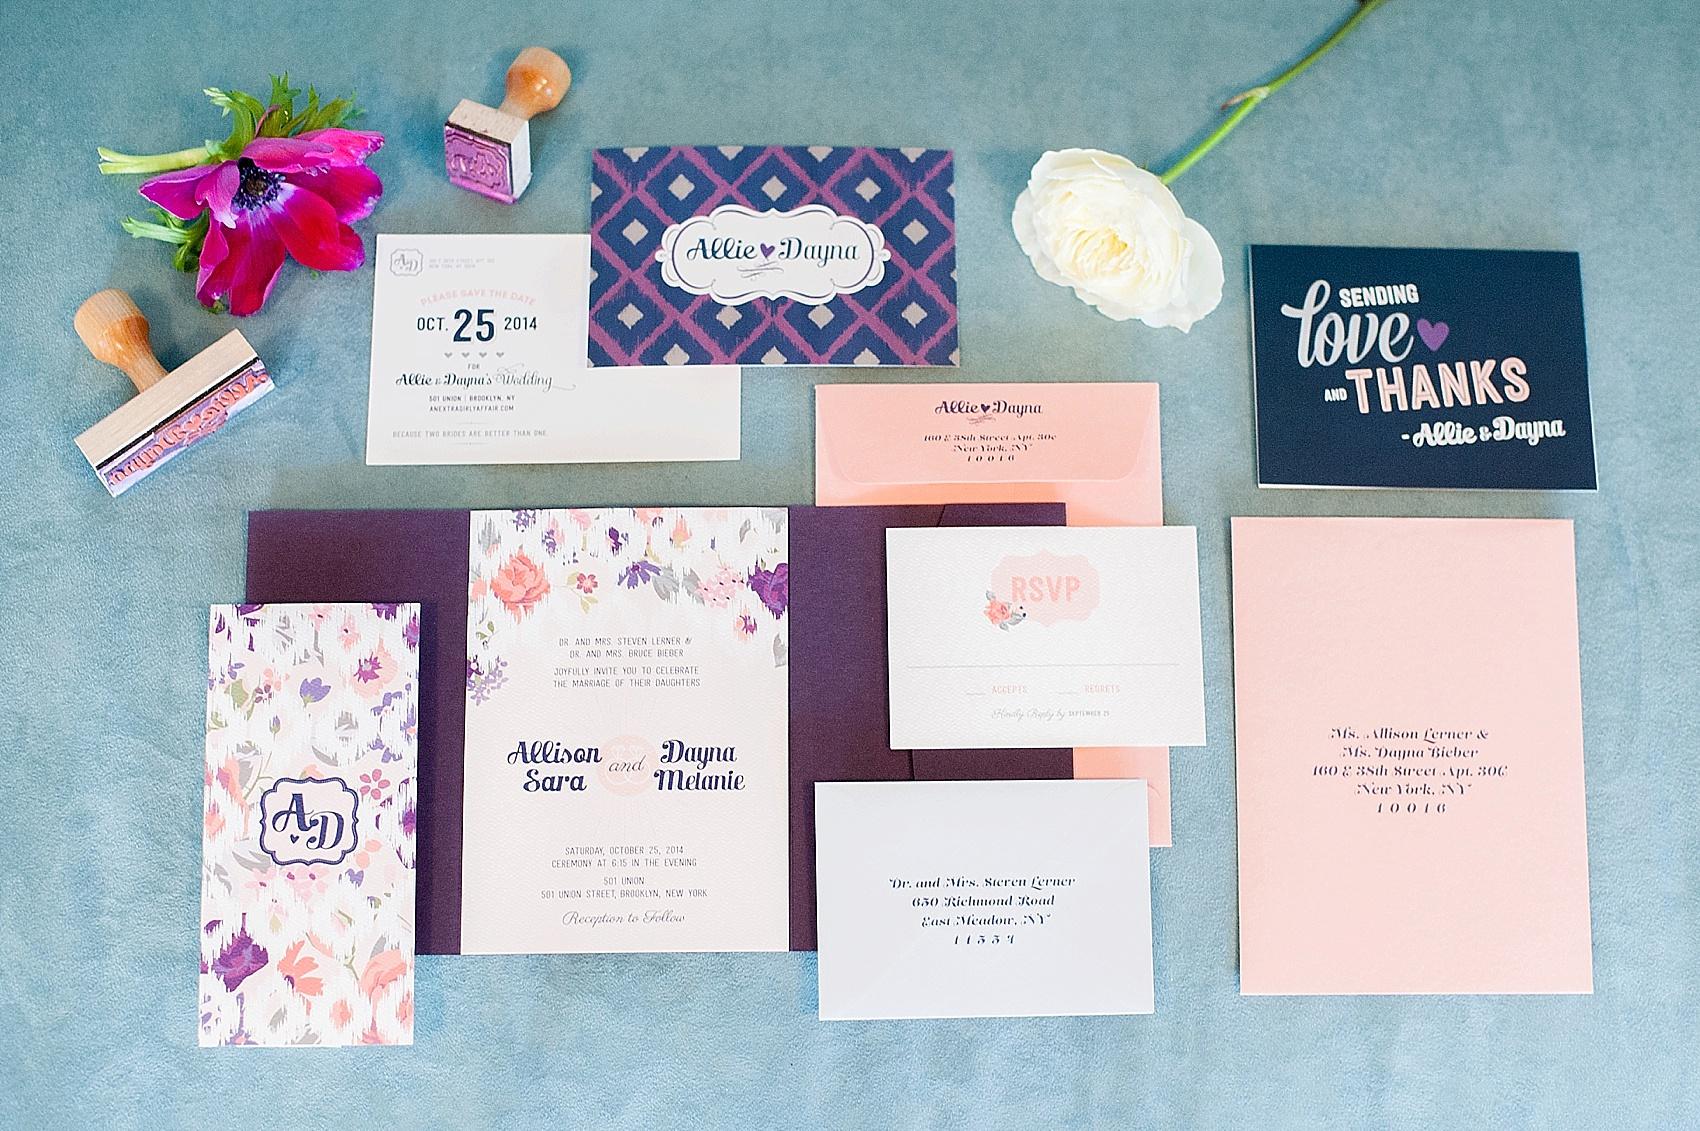 wedding invitations photos stationery paper suites wedding invitation suites Wedding invitations and paper suites by Raleigh wedding photographer Mikkel Paige